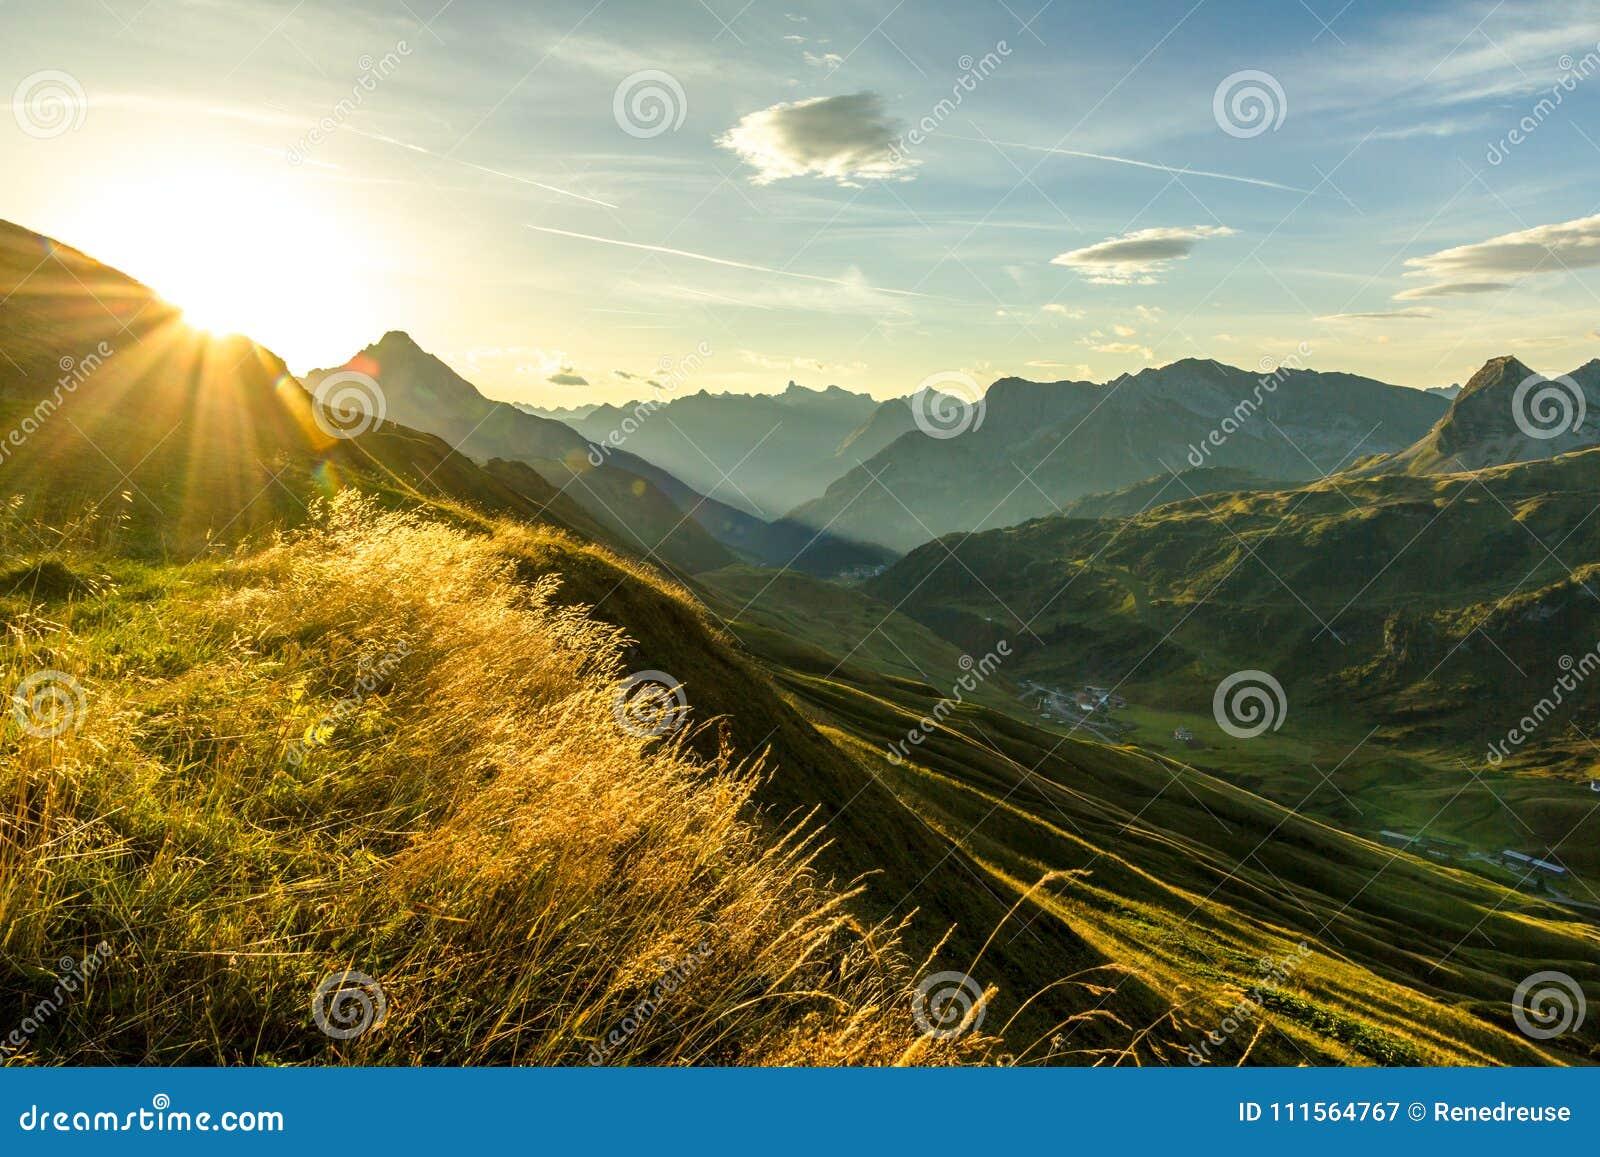 Mooie zonsopgang en gelaagde bergsilhouetten in vroege ochtend Lechtal en Allgau-Alpen, Beieren en Oostenrijk